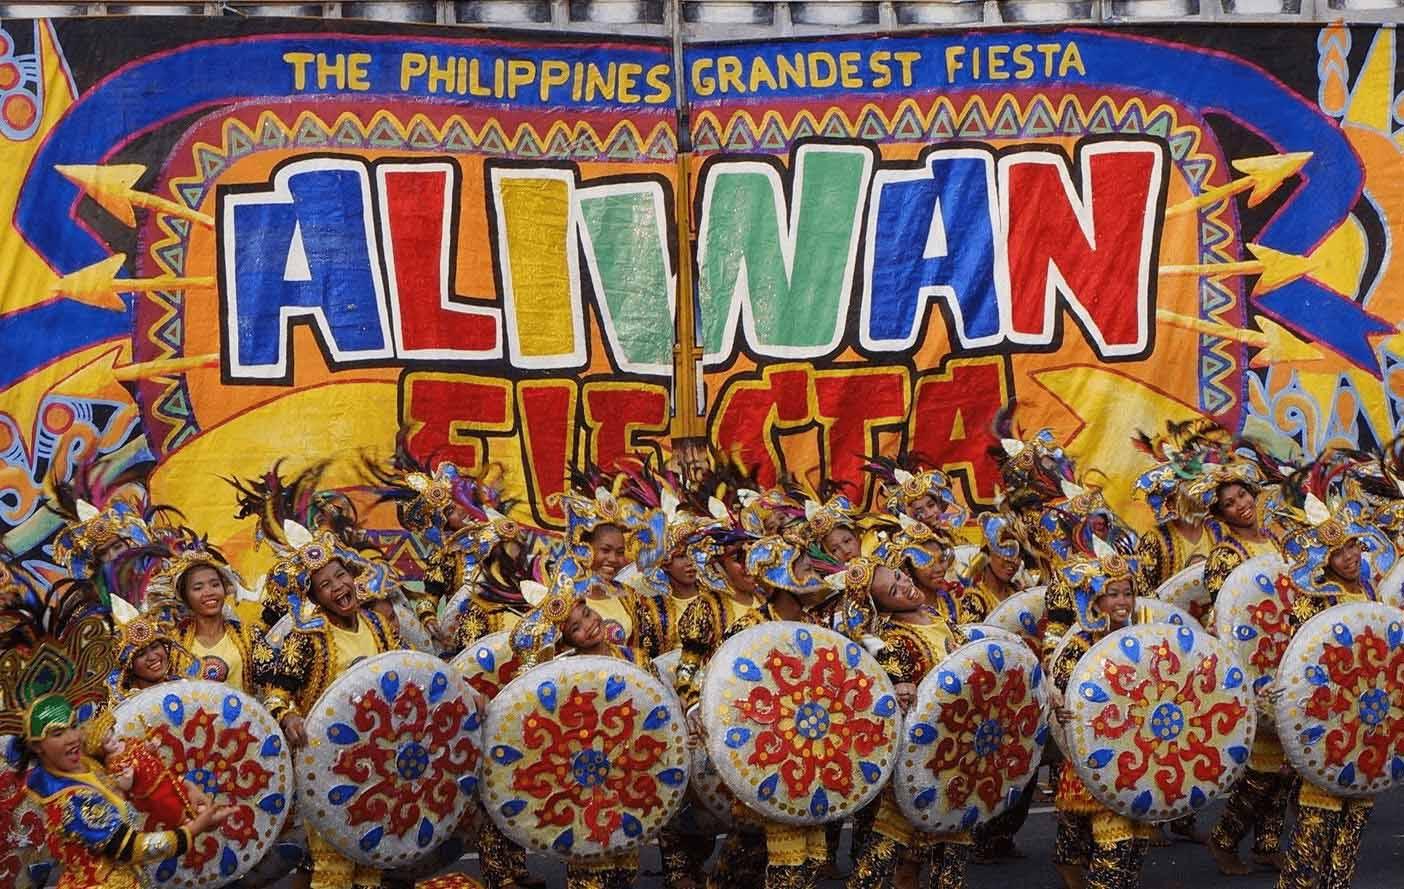 aliwan-fiesta-le-hoi-philippines